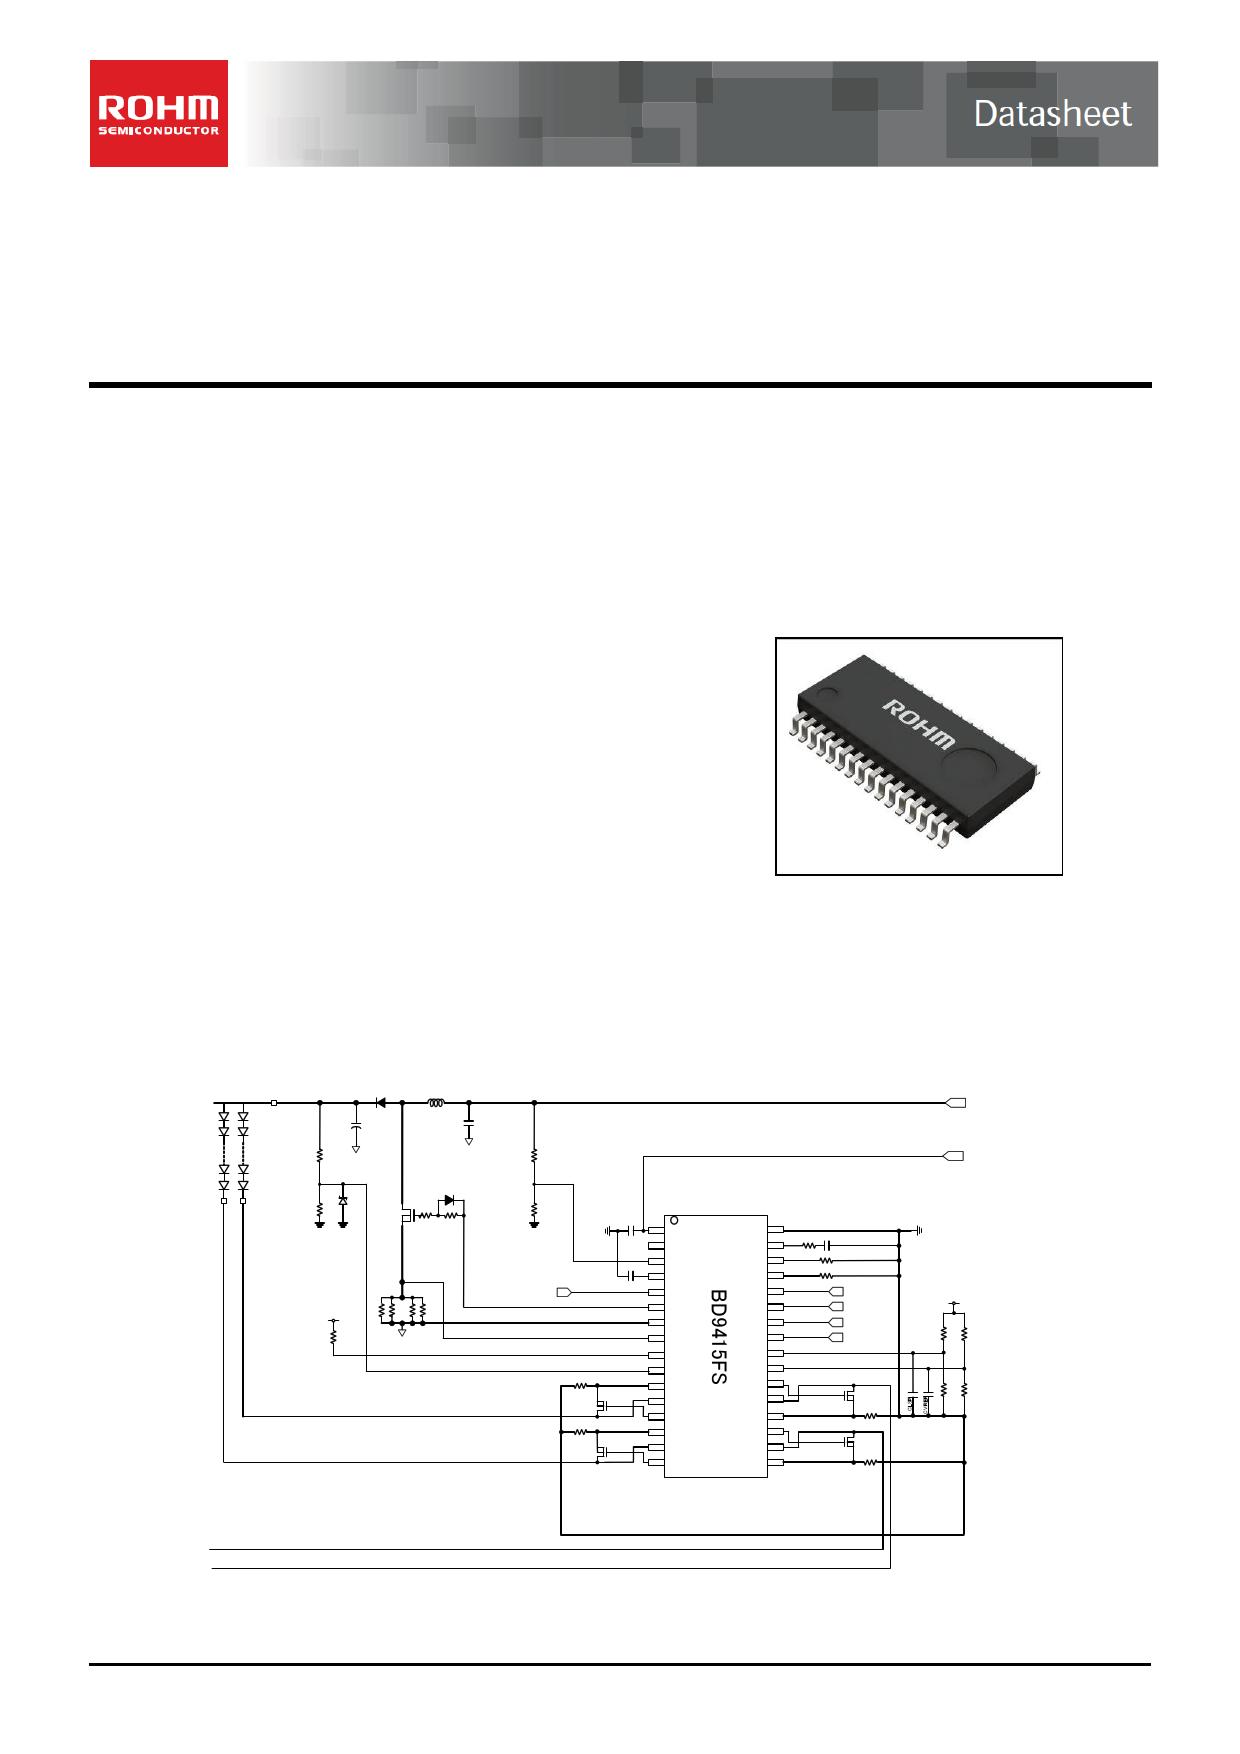 bd9415fs  u30c7 u30fc u30bf u30b7 u30fc u30c8 pdf